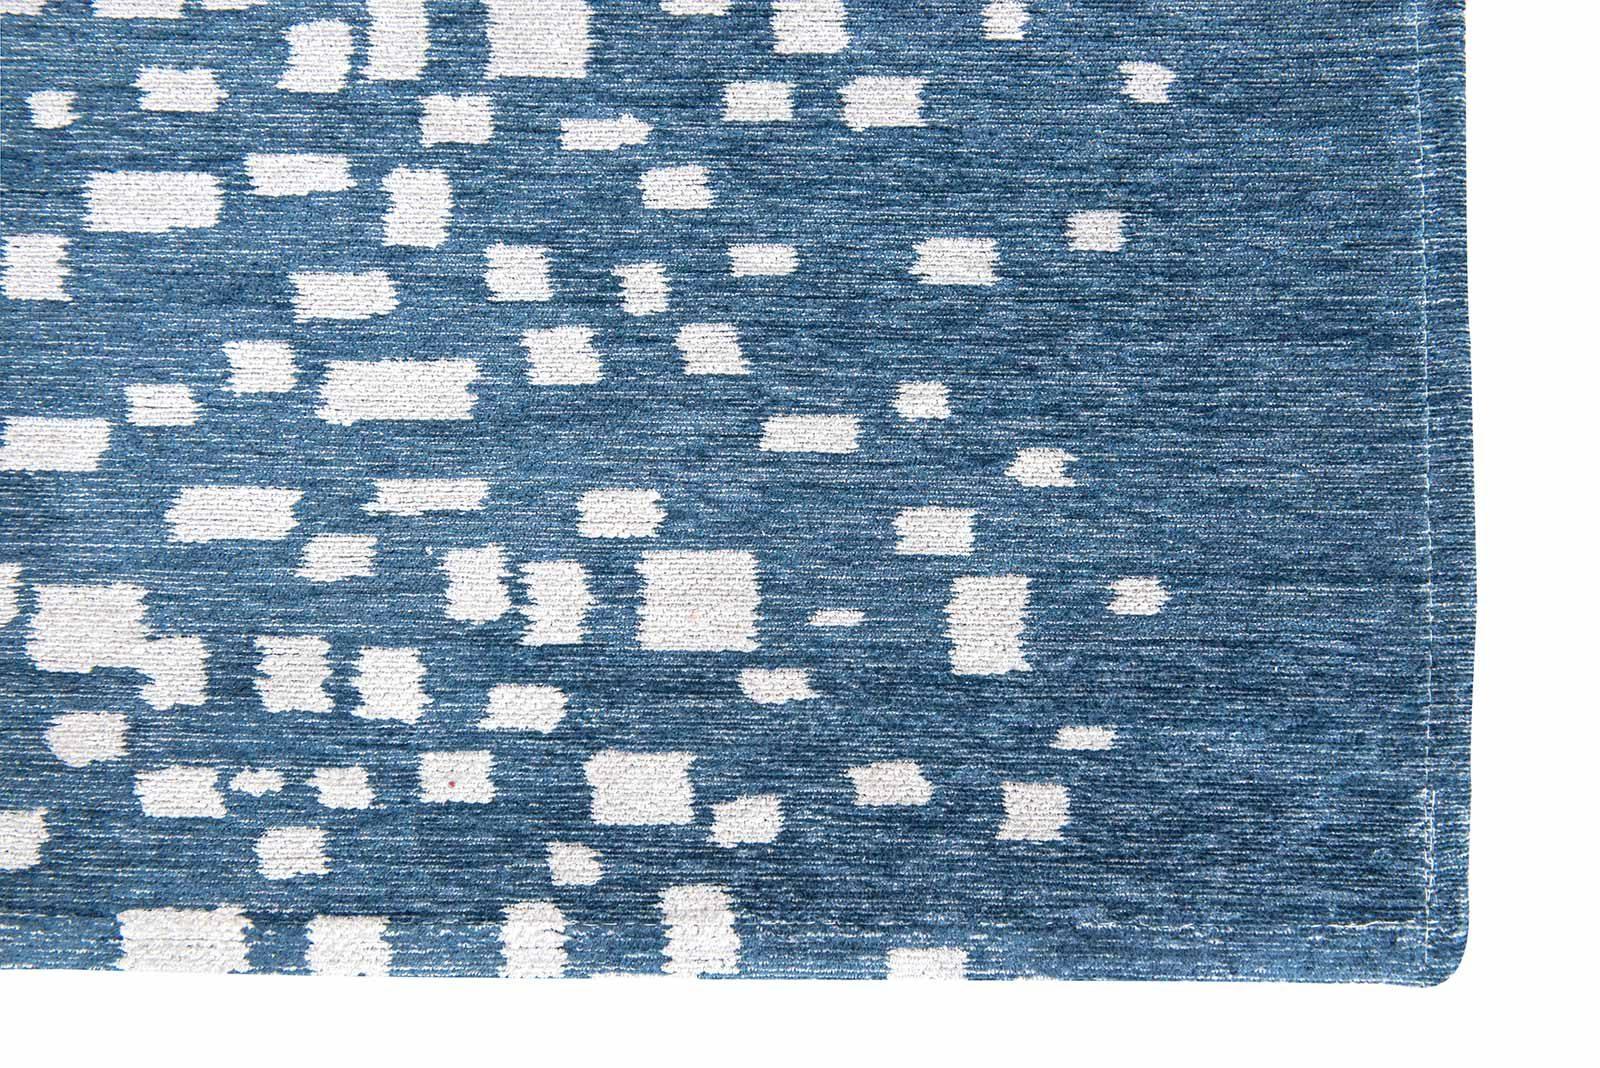 Louis De Poortere alfombras Villa Nova LX 8777 Freyr Indigo corner